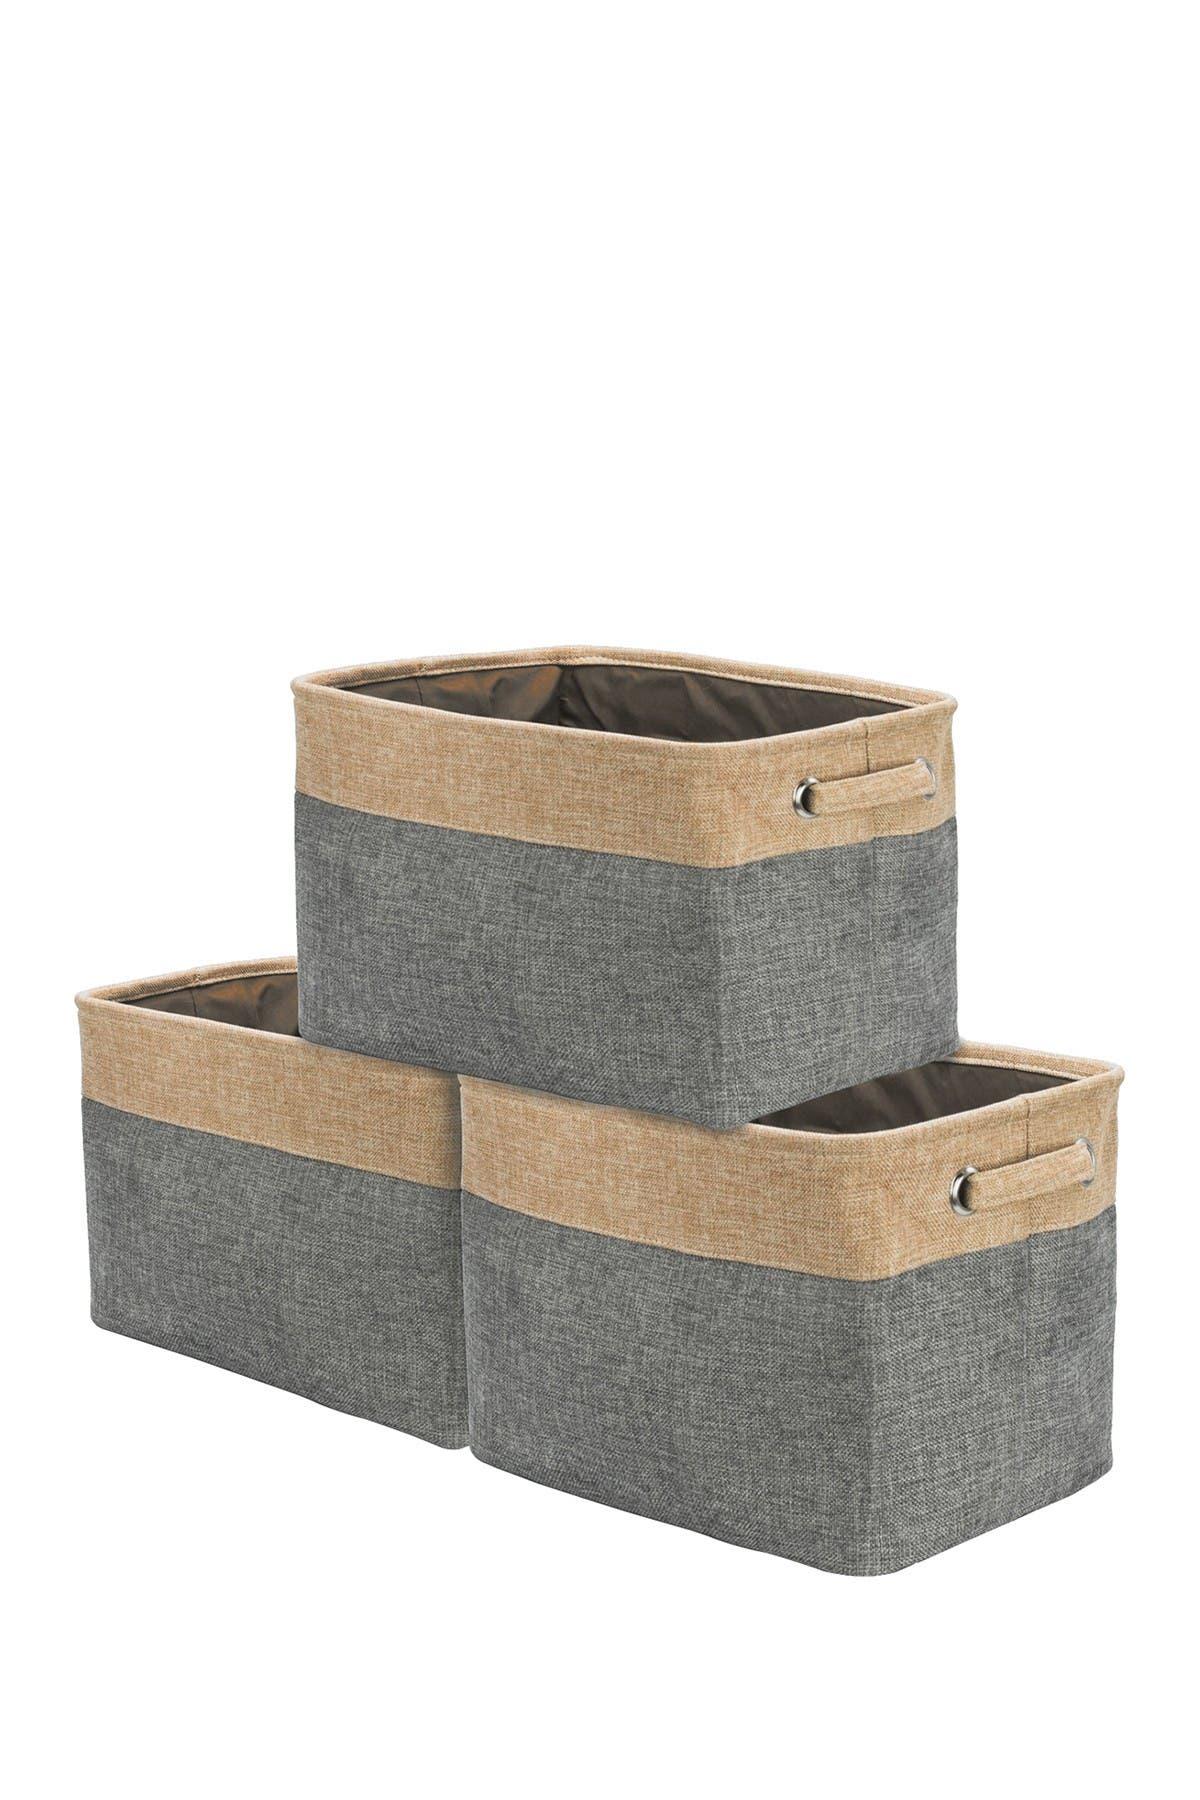 Image of Sorbus Grey Twill Storage Basket - Set of 3